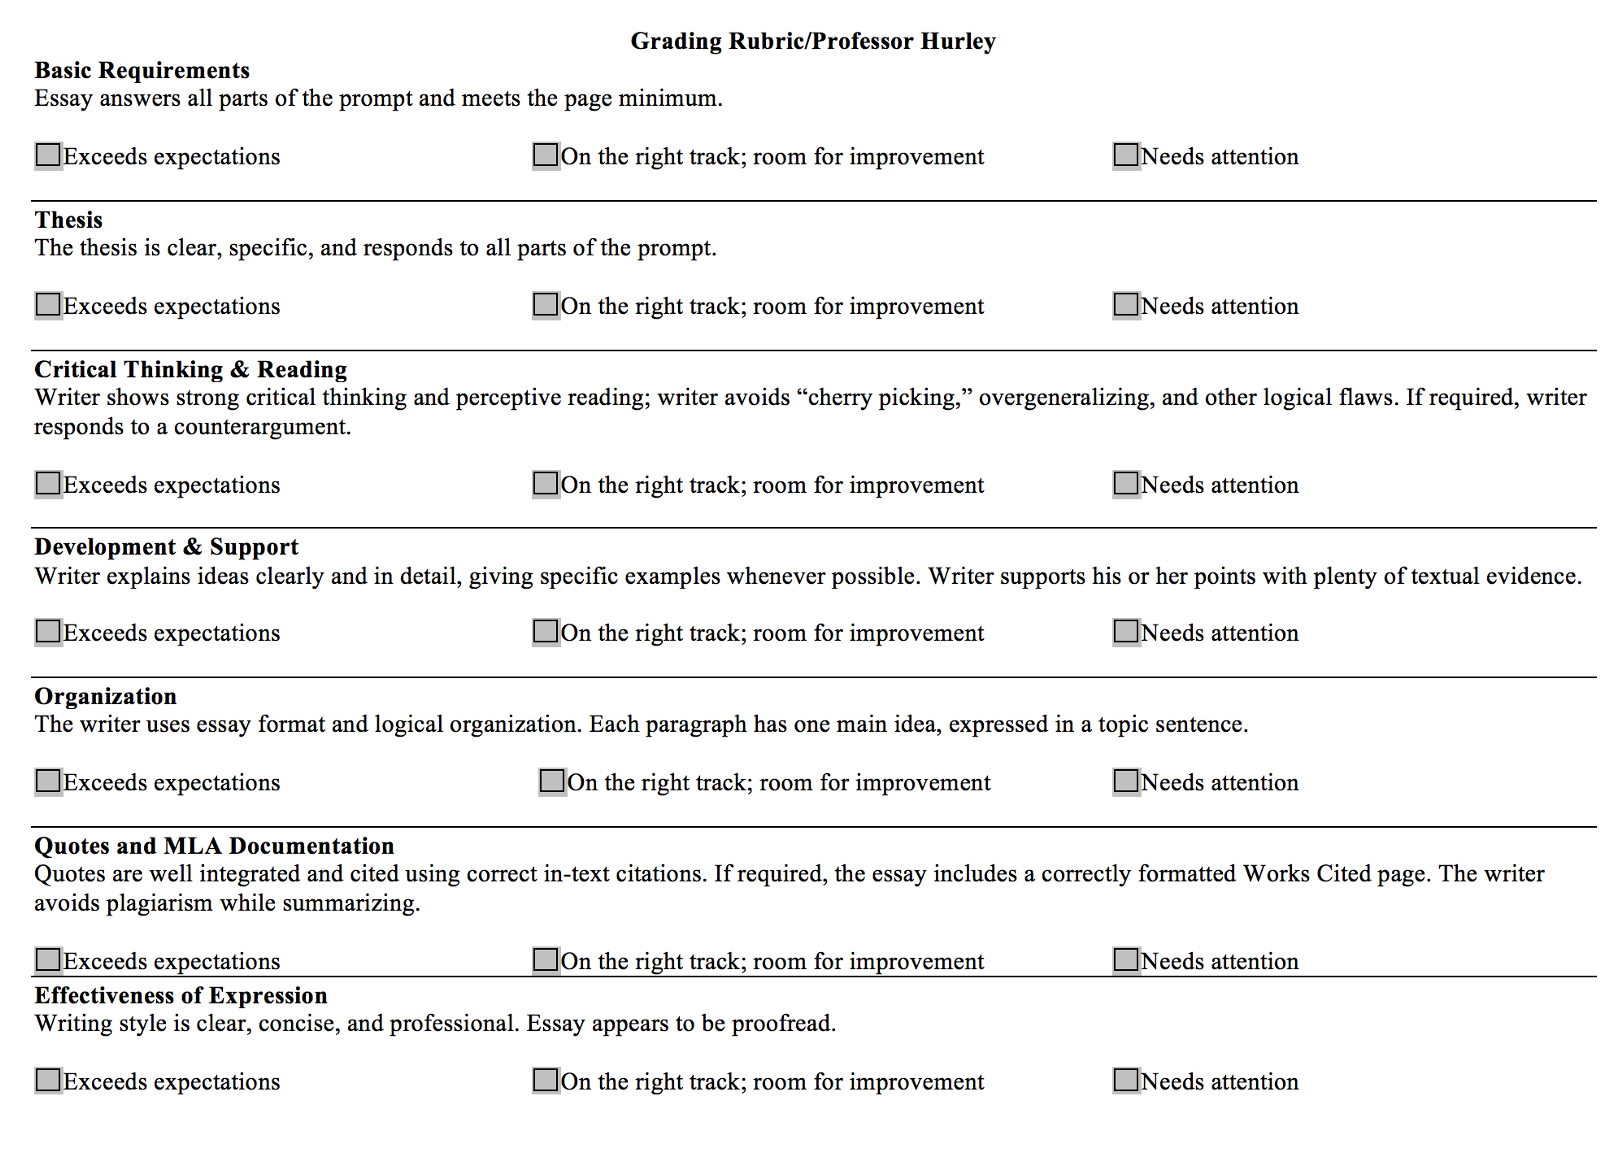 012 Essay Example Rubrics For Writing 1l7bkjqmu2kth Pcoqy7bgg Rare High School Doc Pdf Full